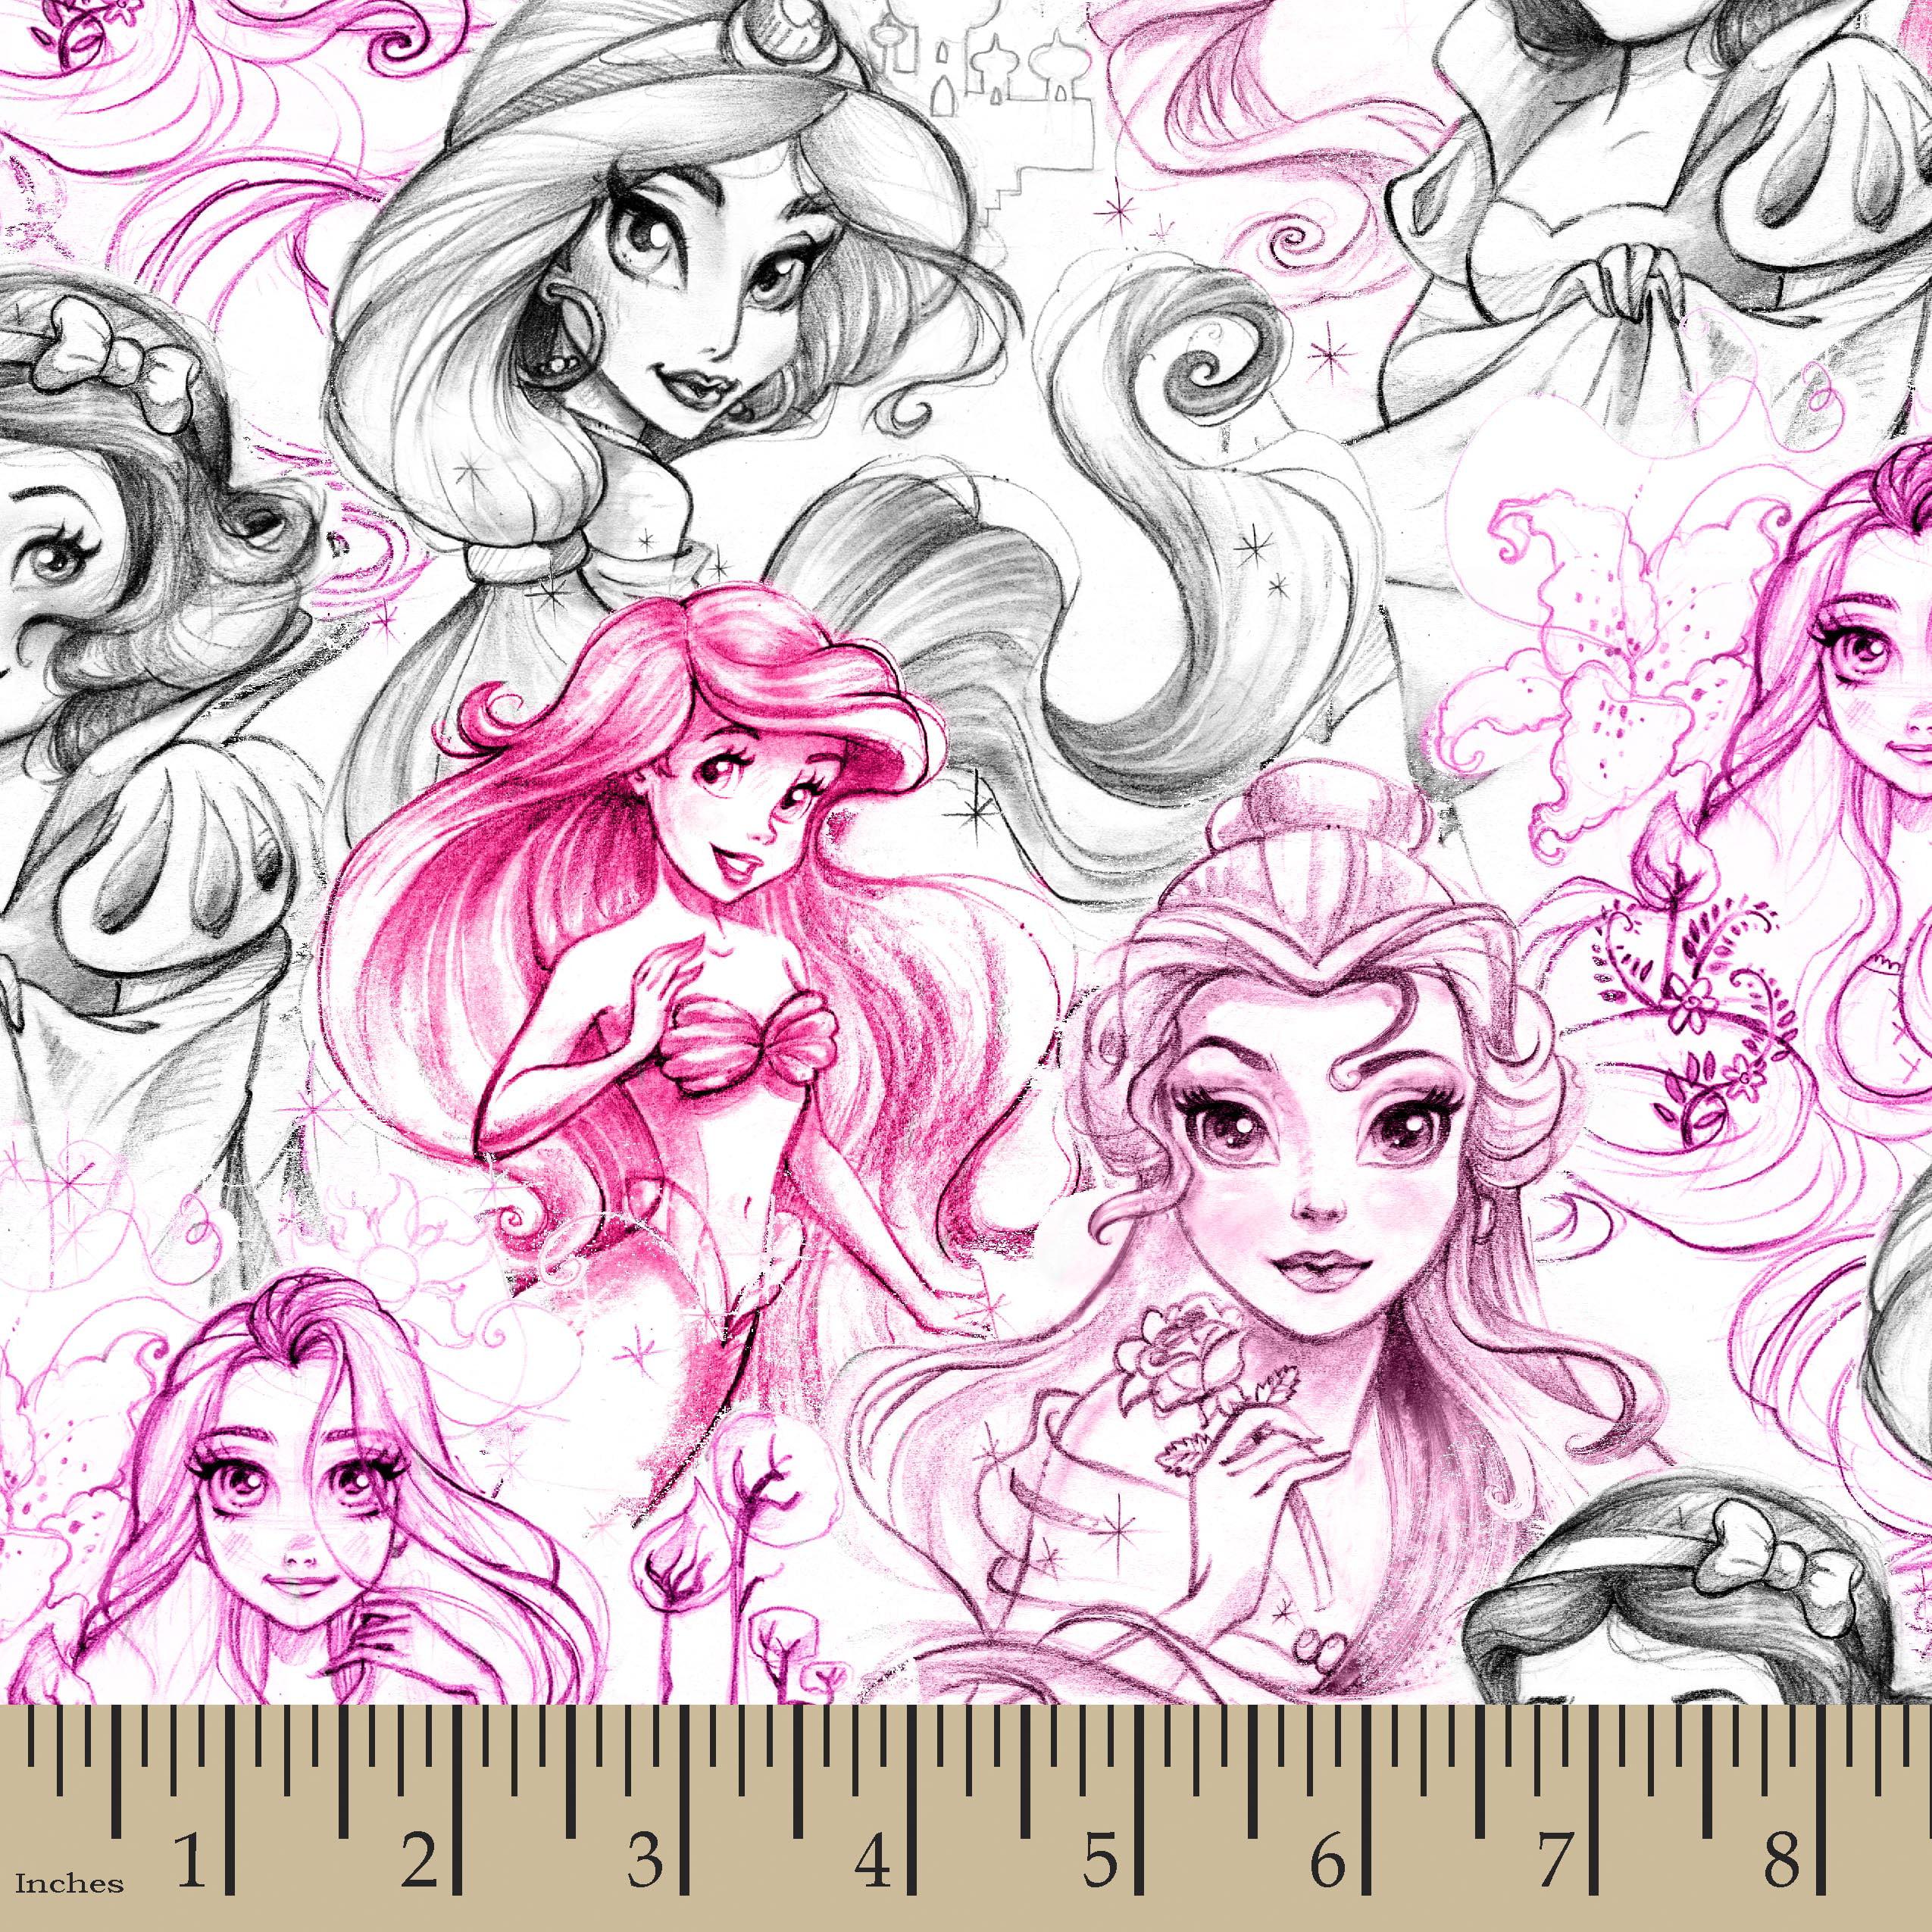 Disney Princess Enchanting Stories Sketch Cotton Fabric by the yard